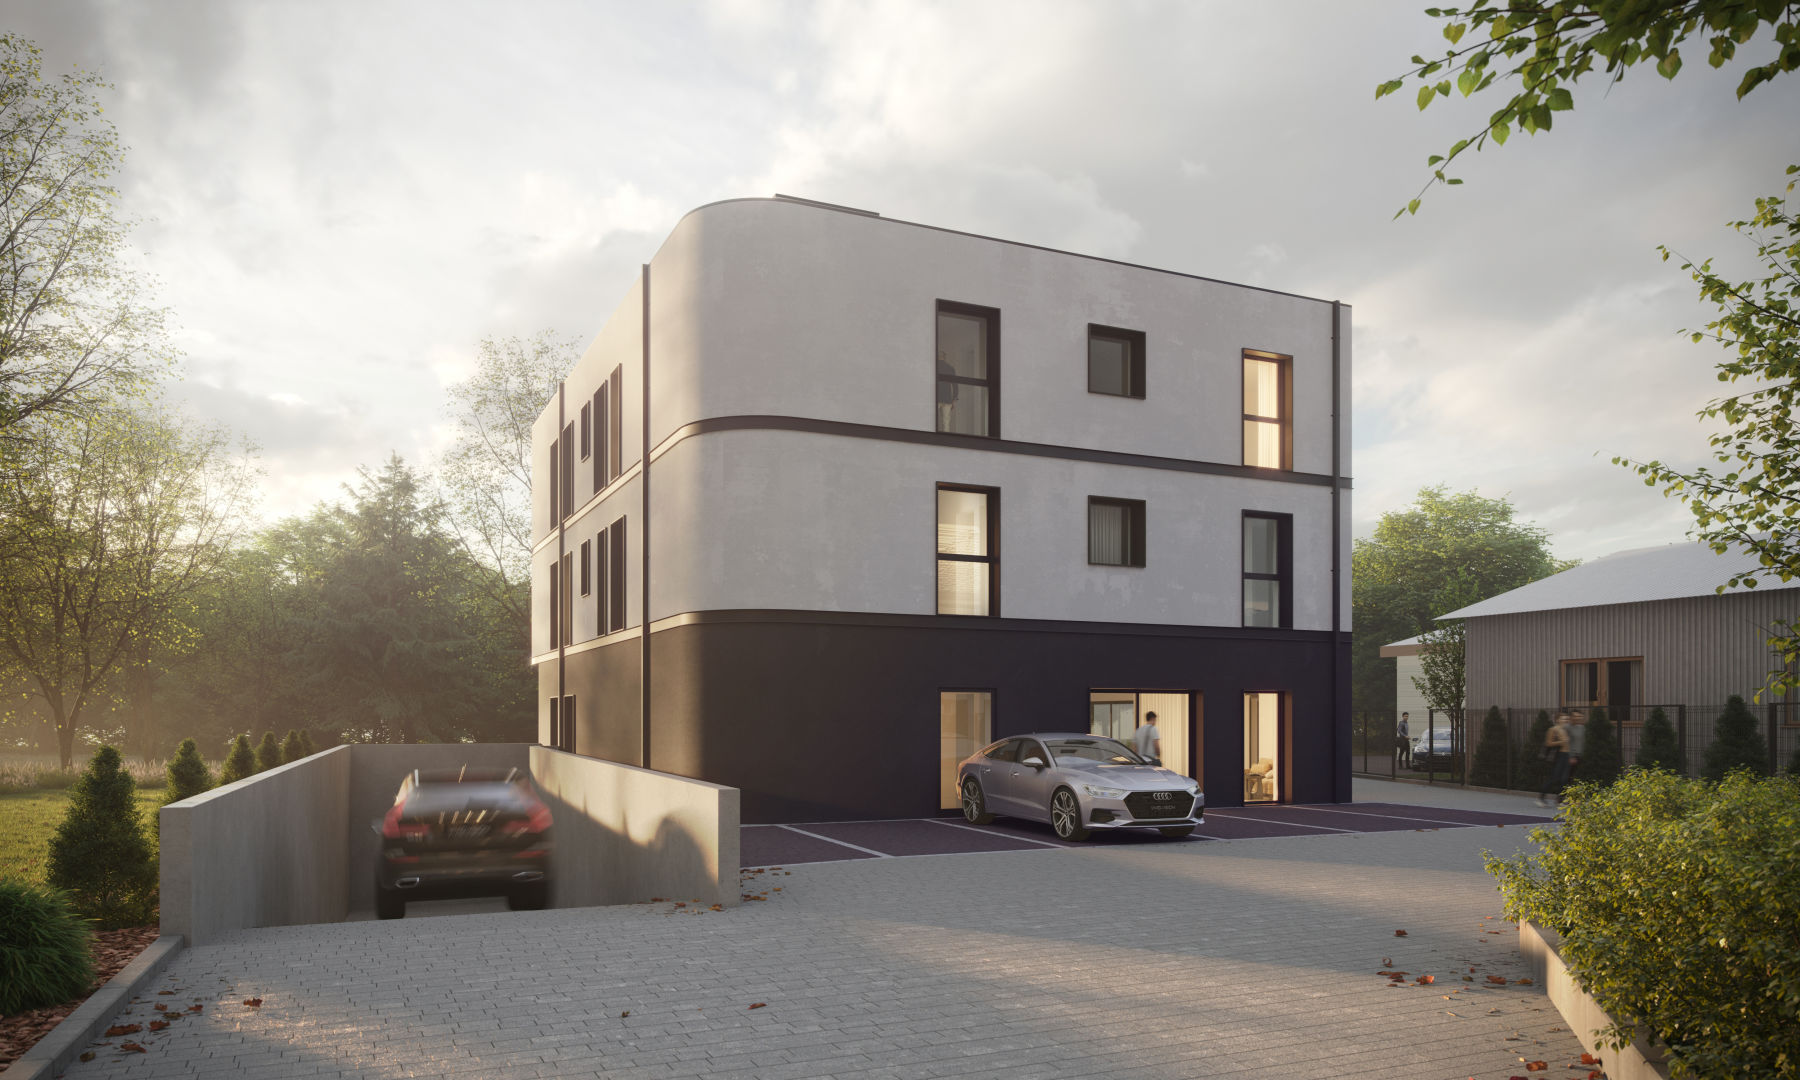 Immobilienprojekt in Weiswampach